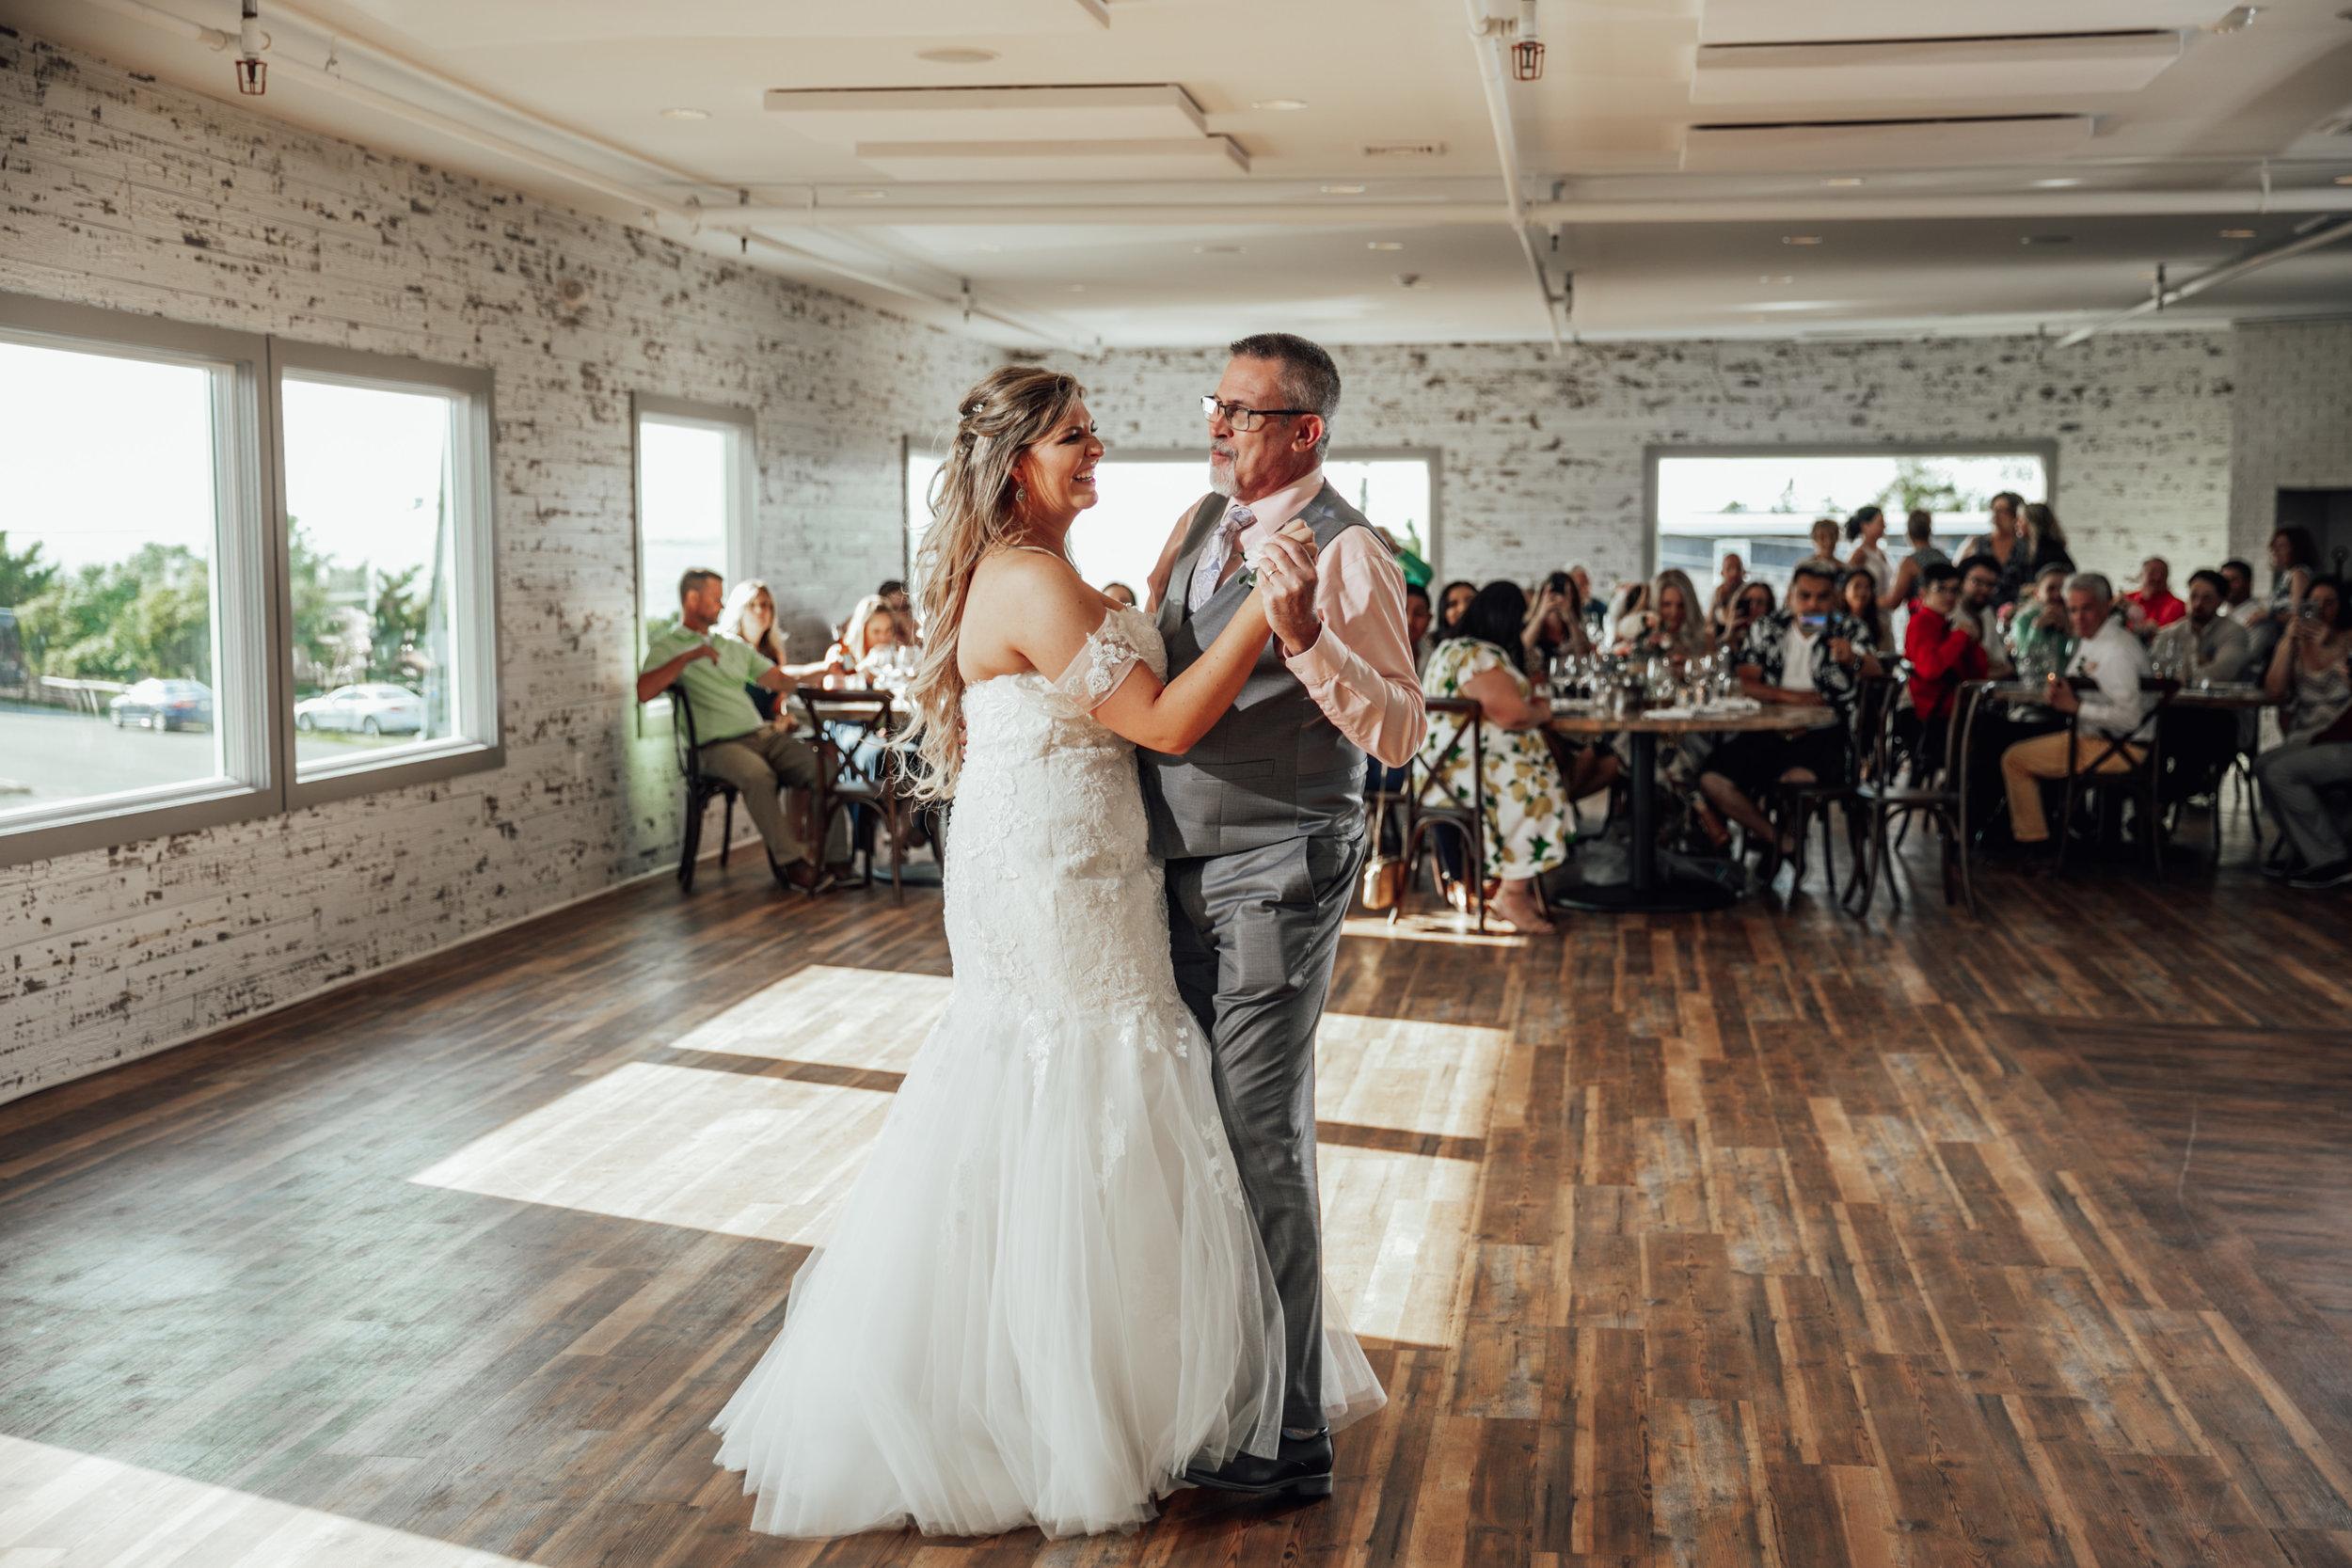 New Jersey Wedding Photographer, Felsberg Photography LBI wedding photography 93.jpg